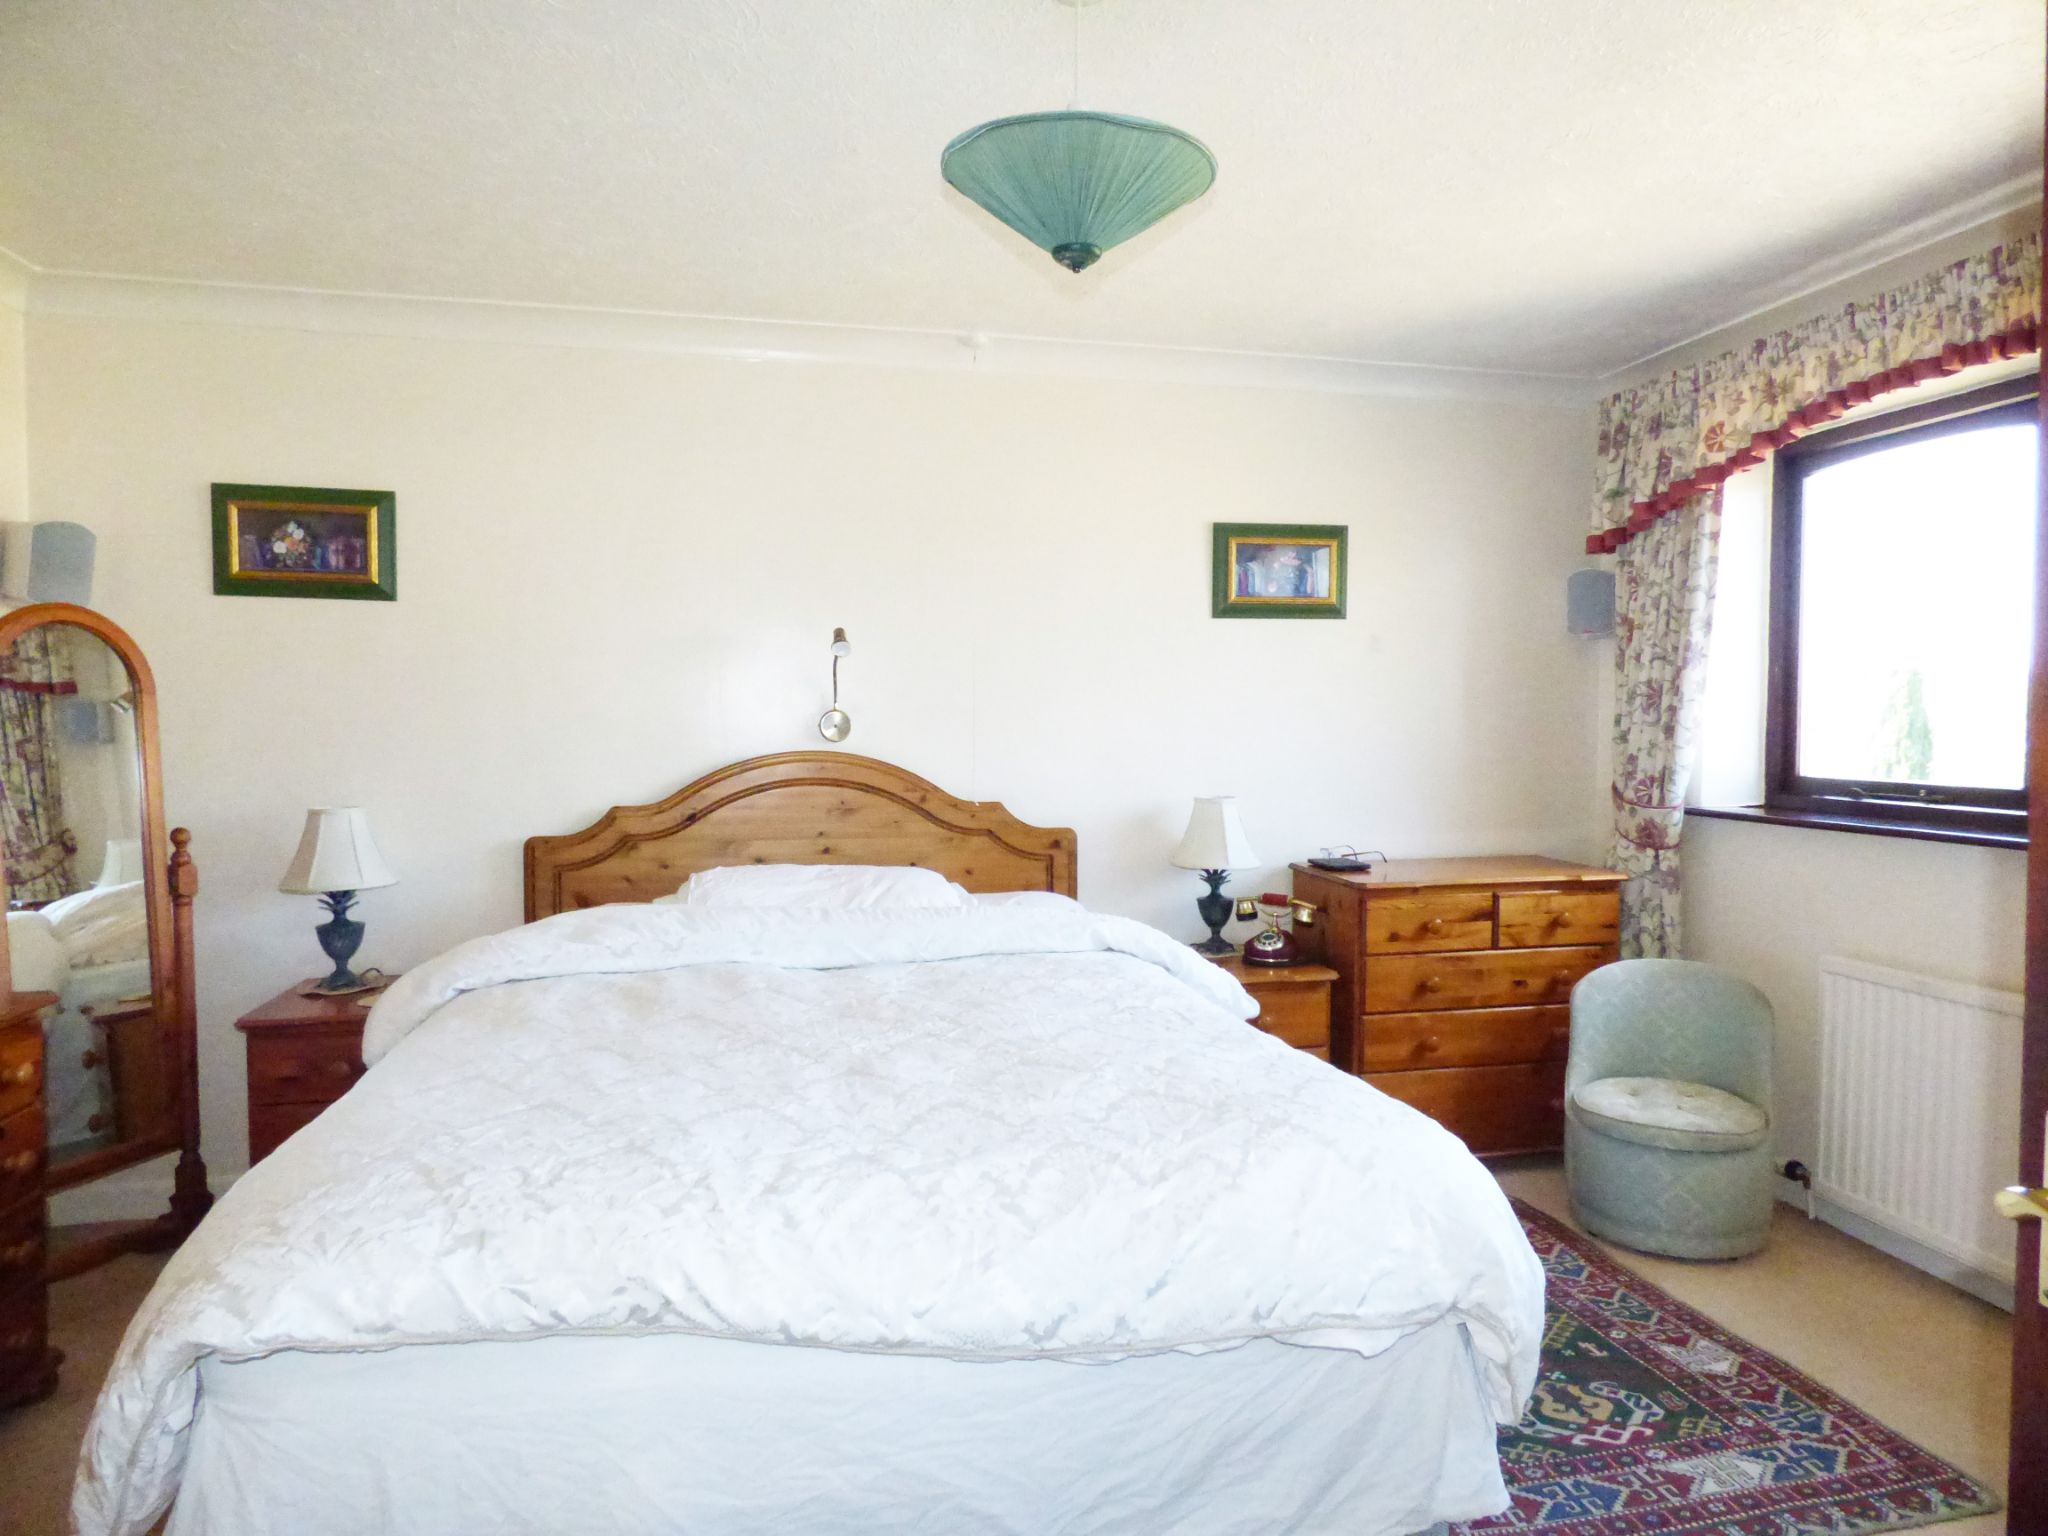 3 Bedroom Detached House For Sale - Bedroom 1